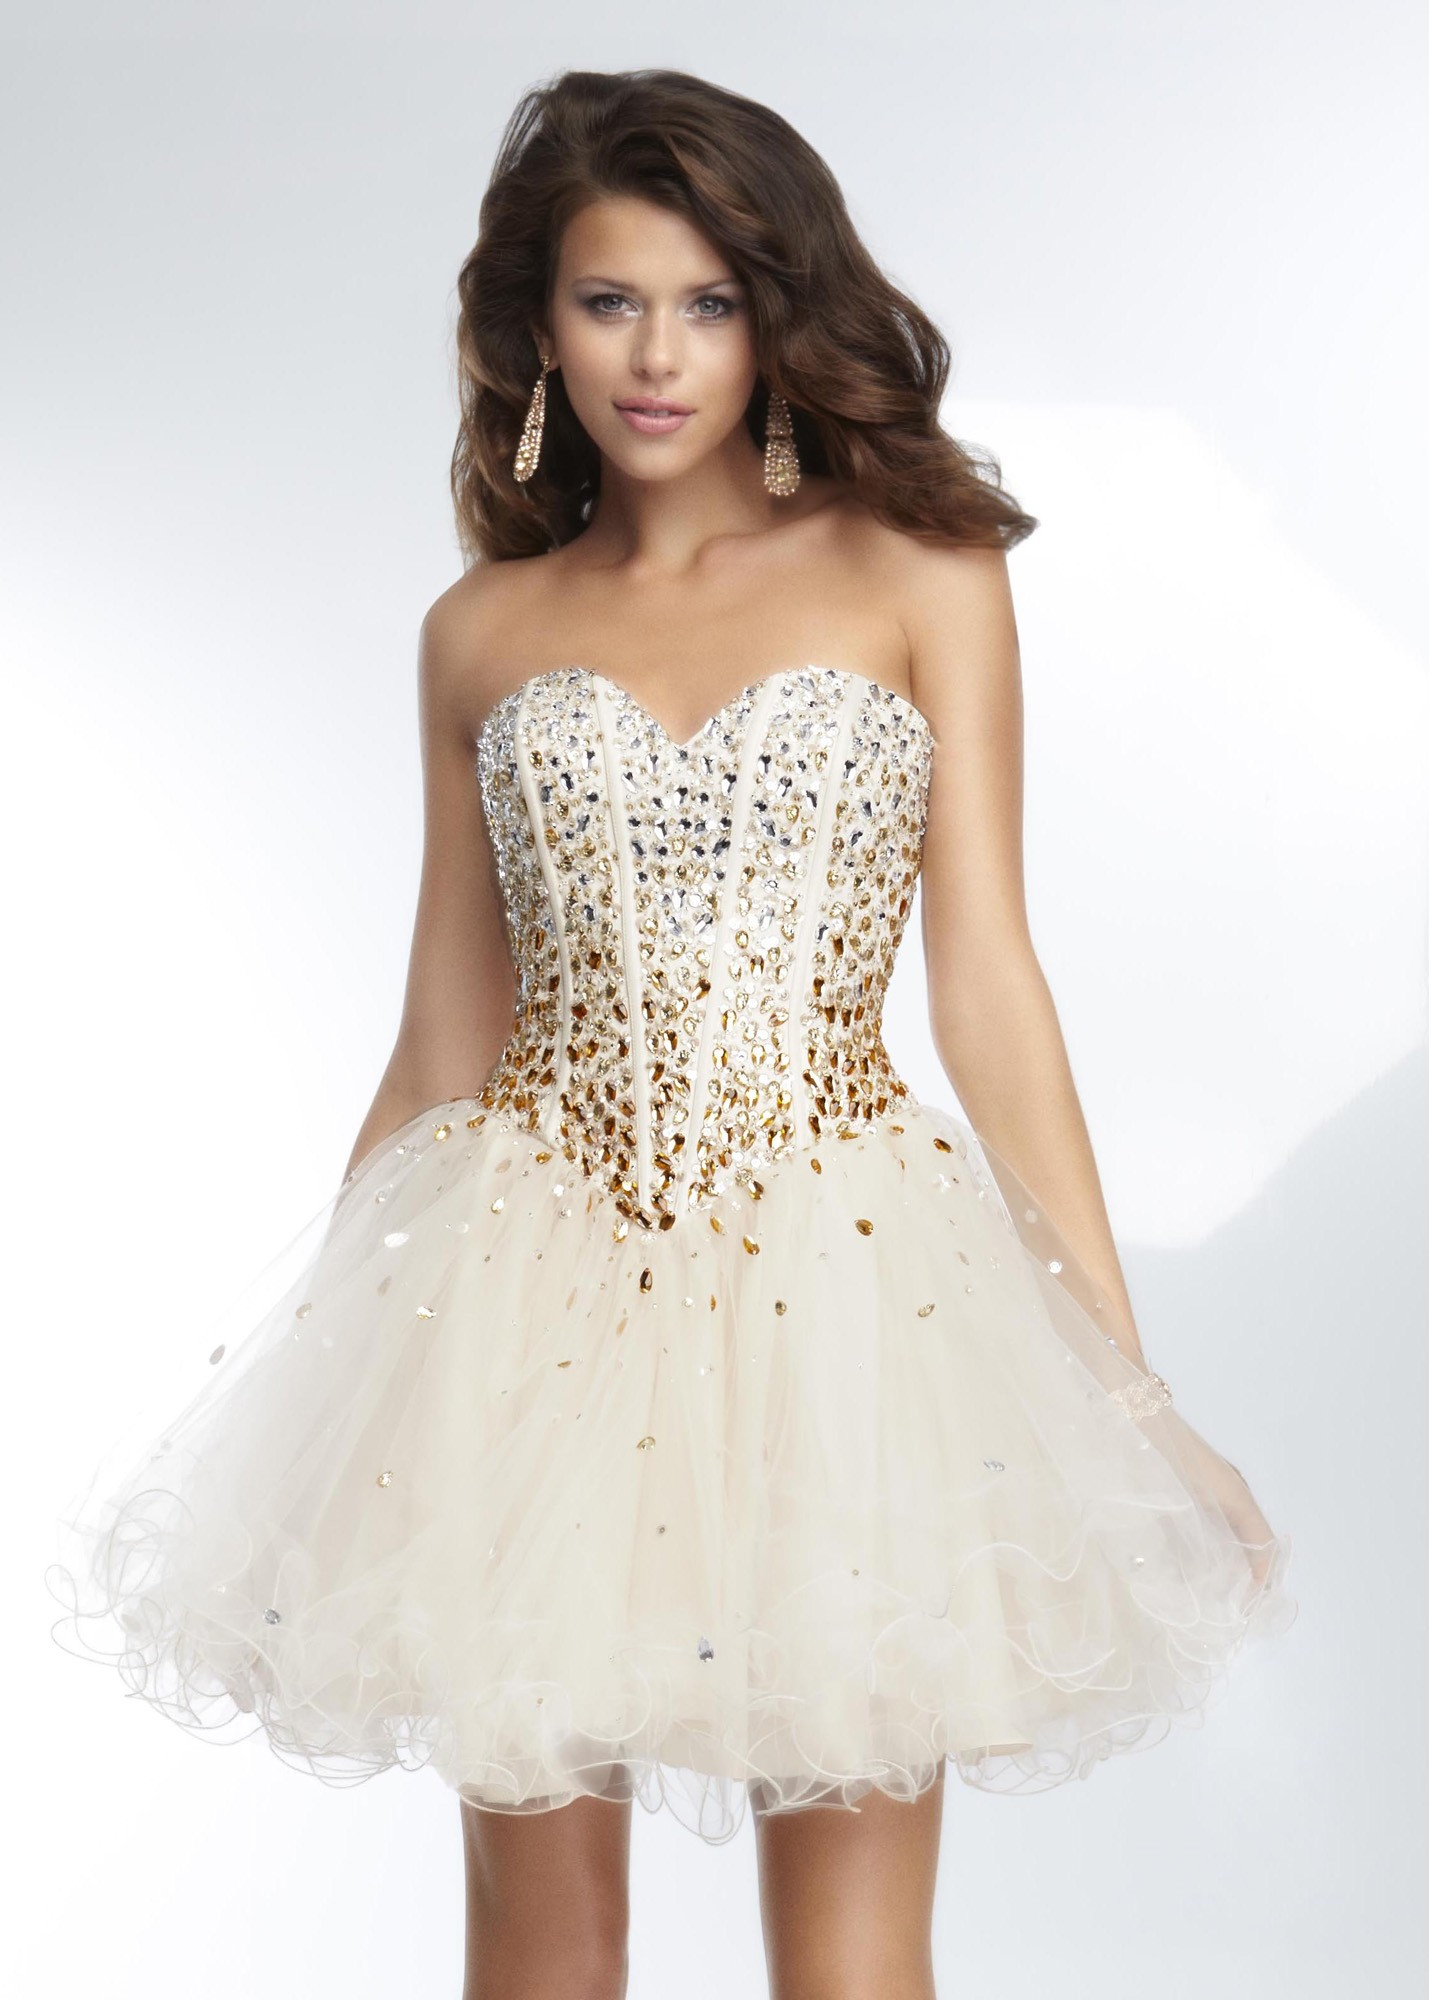 Corset Short Prom Dresses - Long Dresses Online